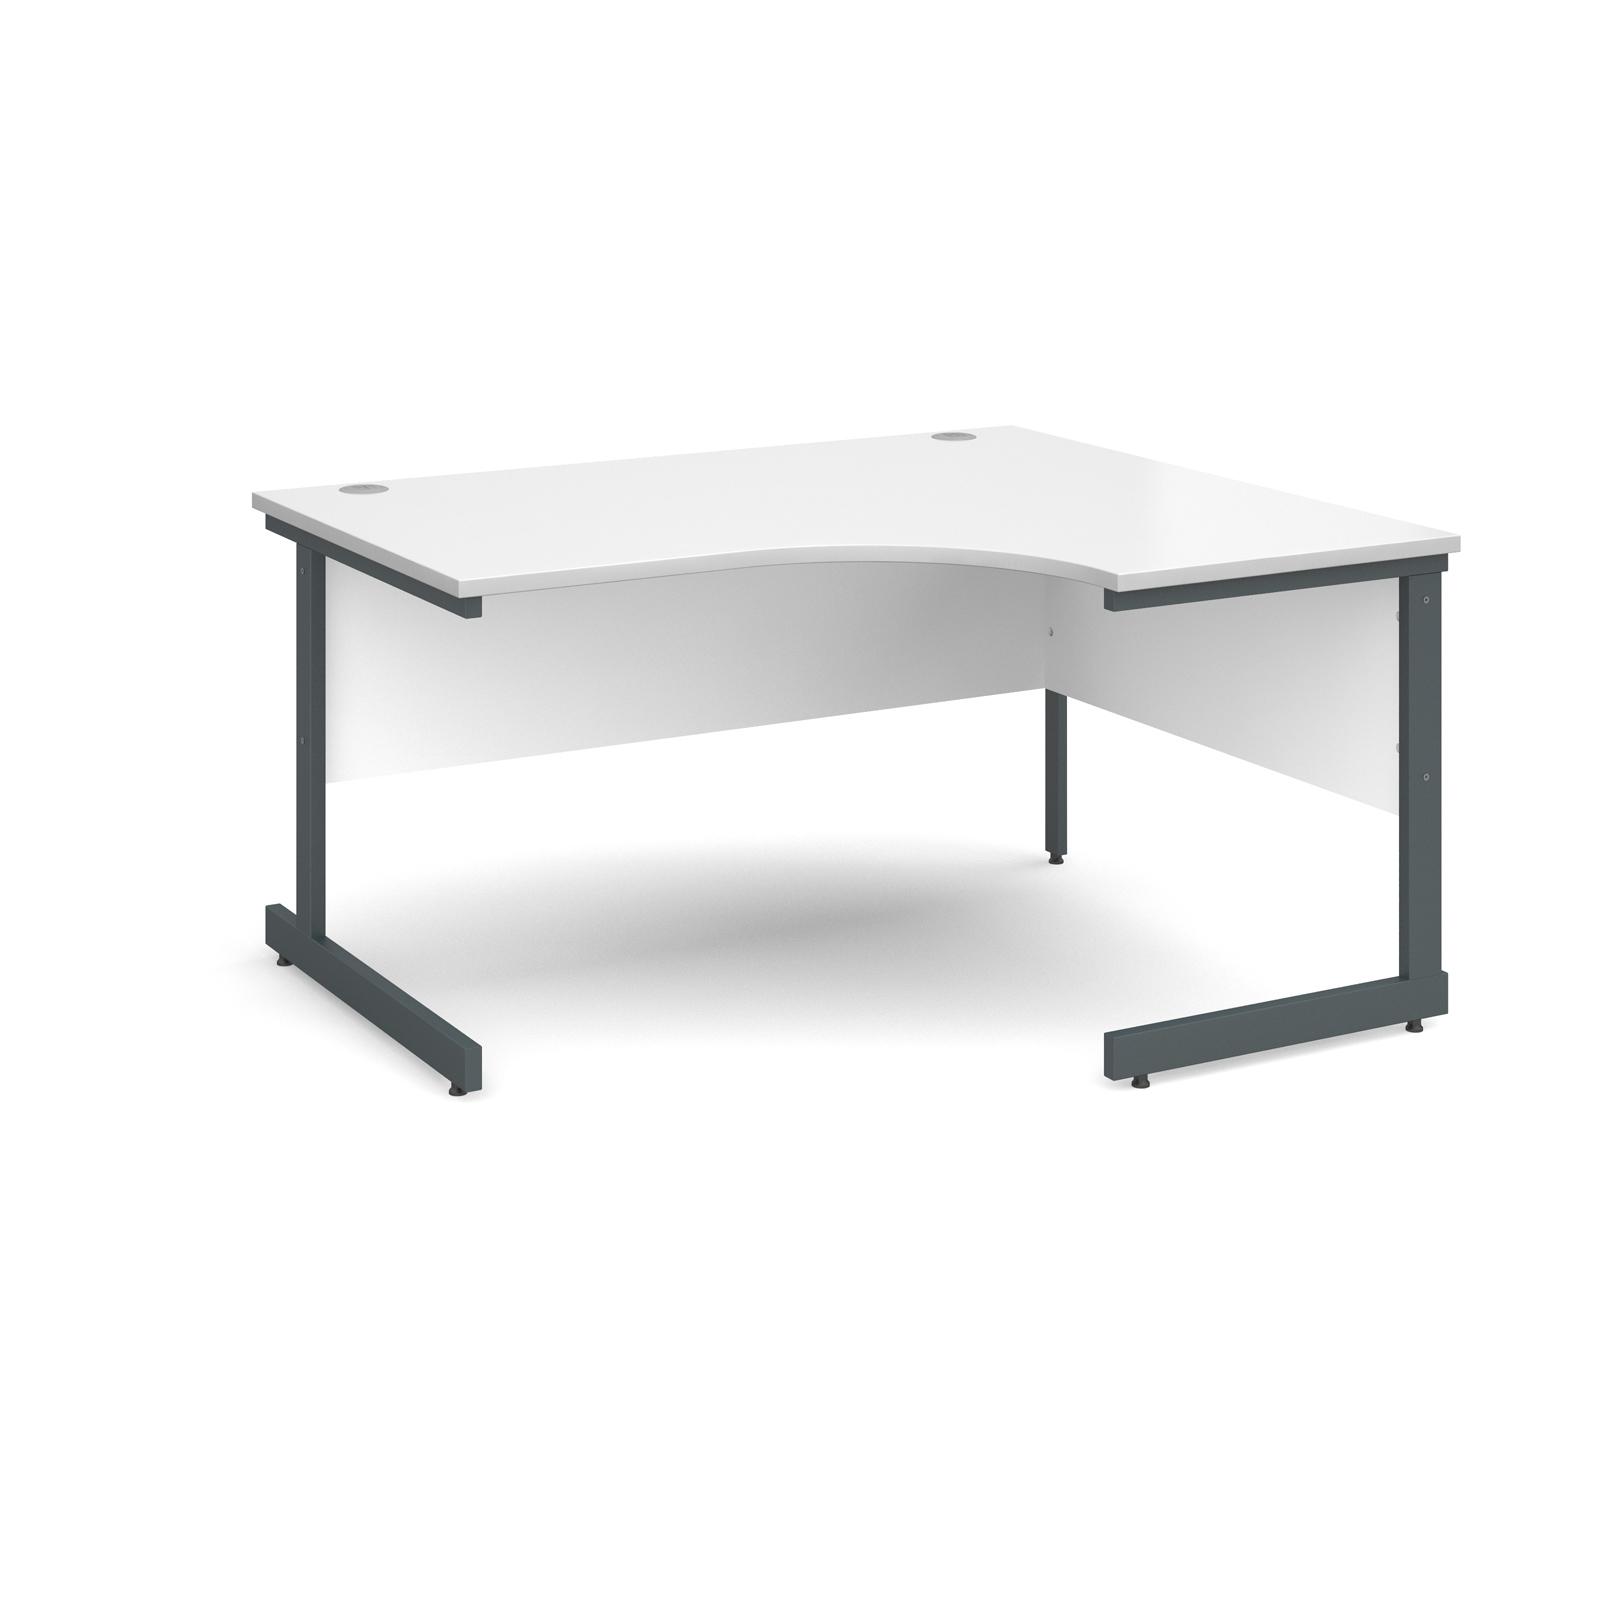 Contract 25 right hand ergonomic desk 1400mm - graphite cantilever frame, white top